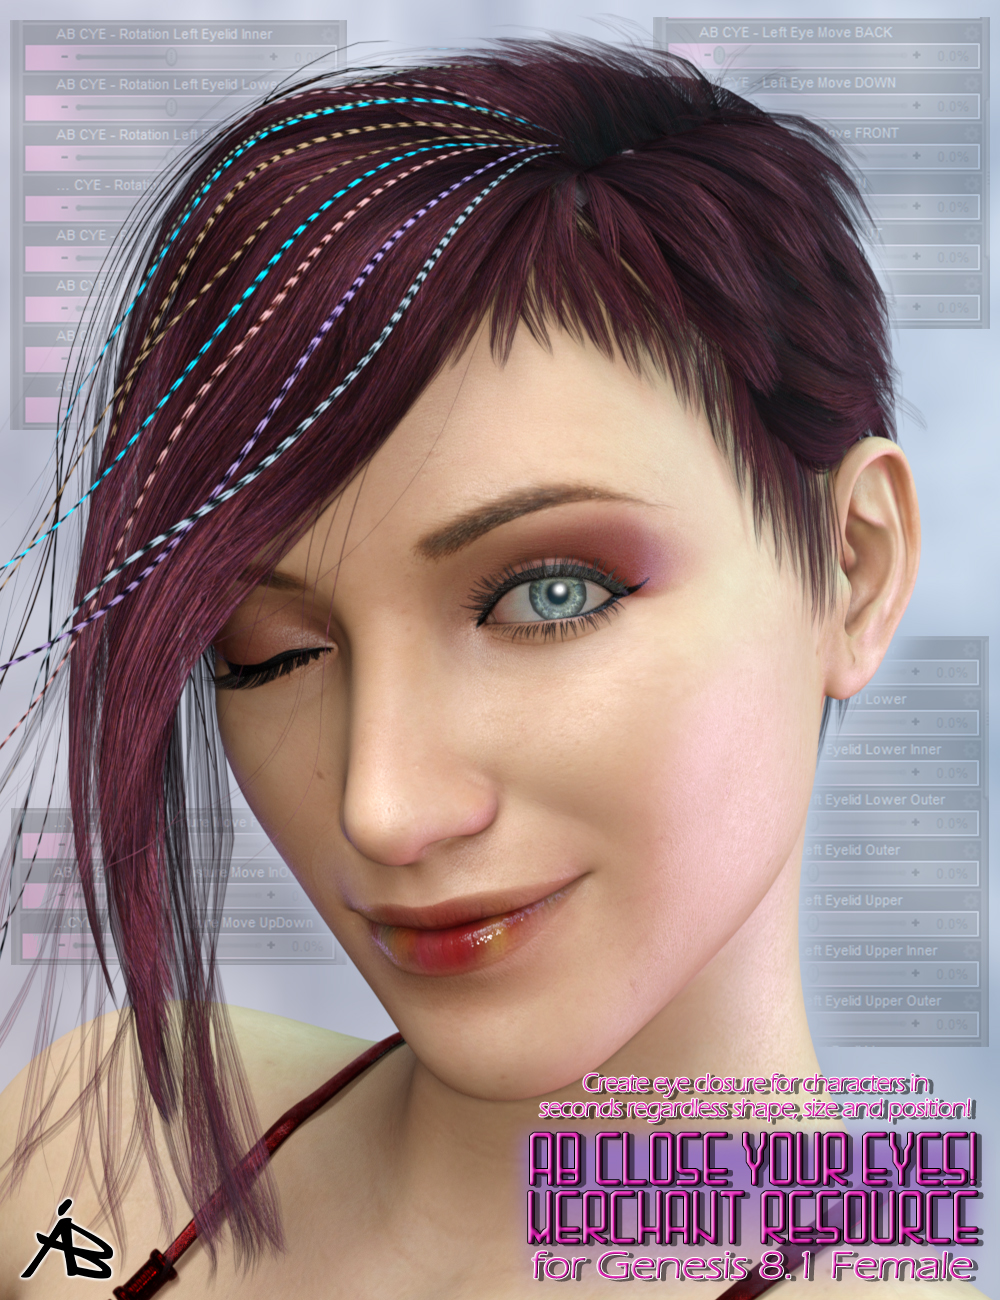 AB Close Your Eyes! for Genesis 8.1 Female (MR) by: AuraBianca, 3D Models by Daz 3D